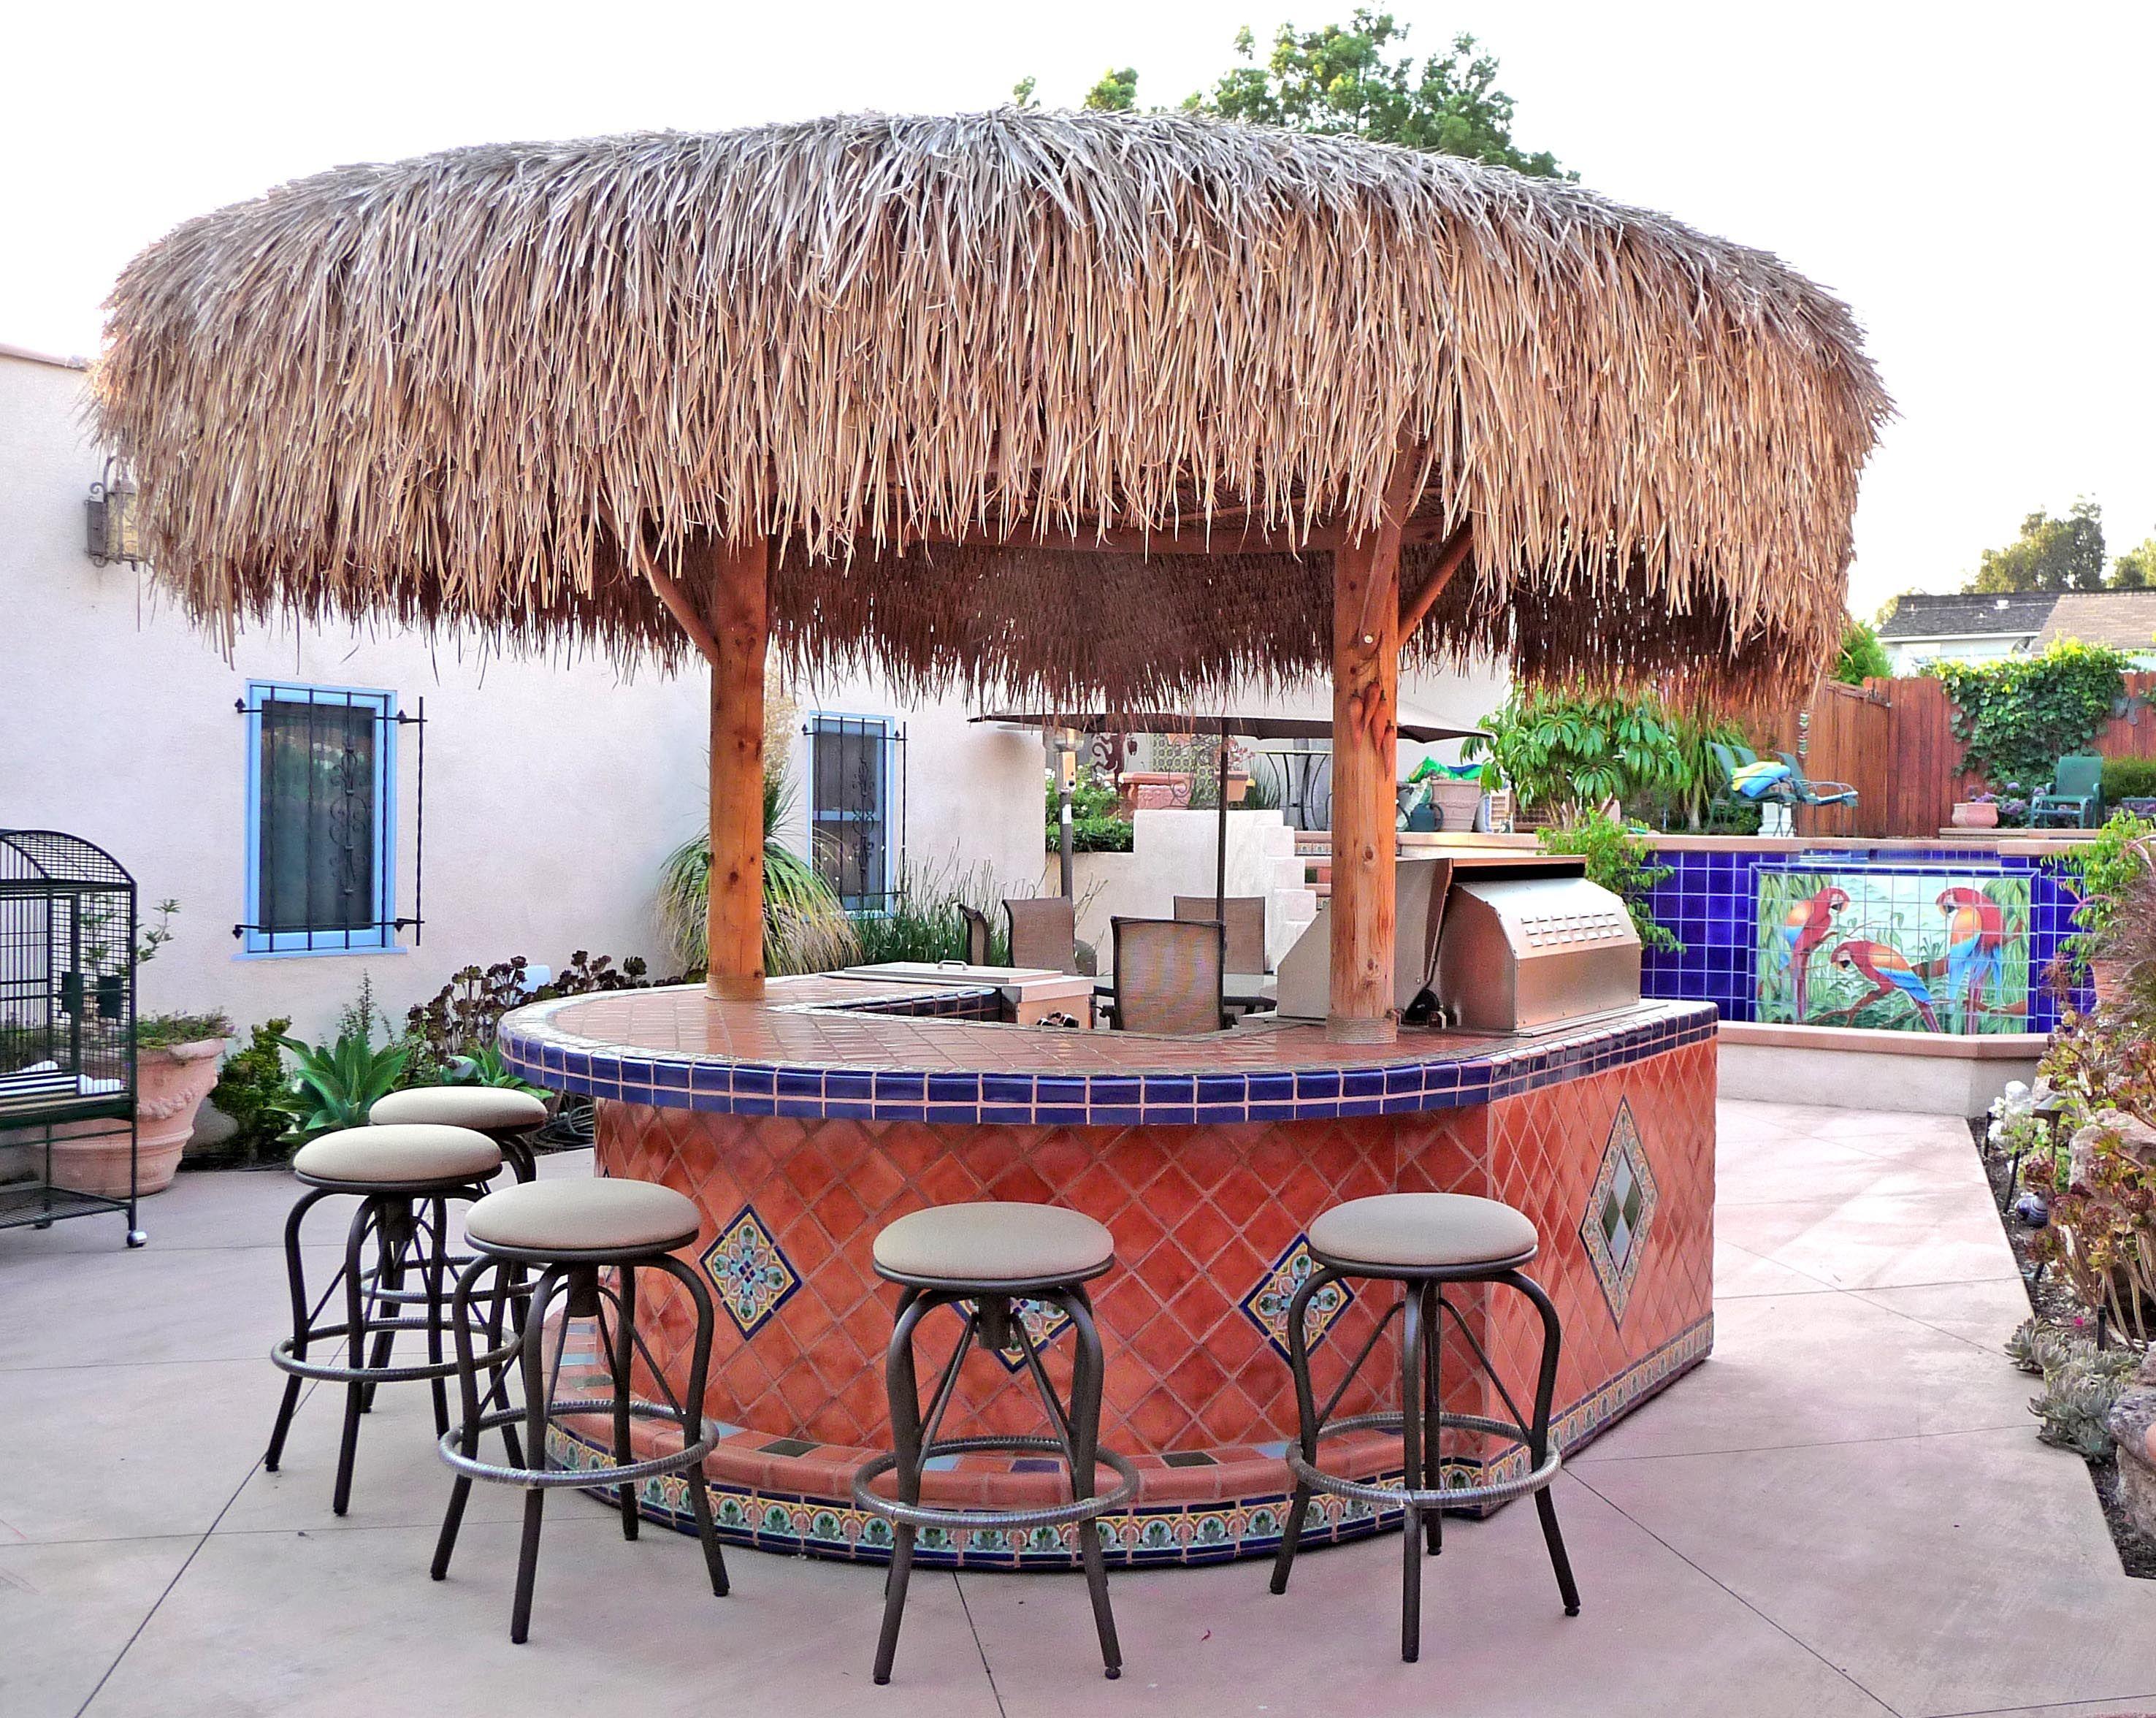 Tiki Hut Style In Mexico | Decorative Journals